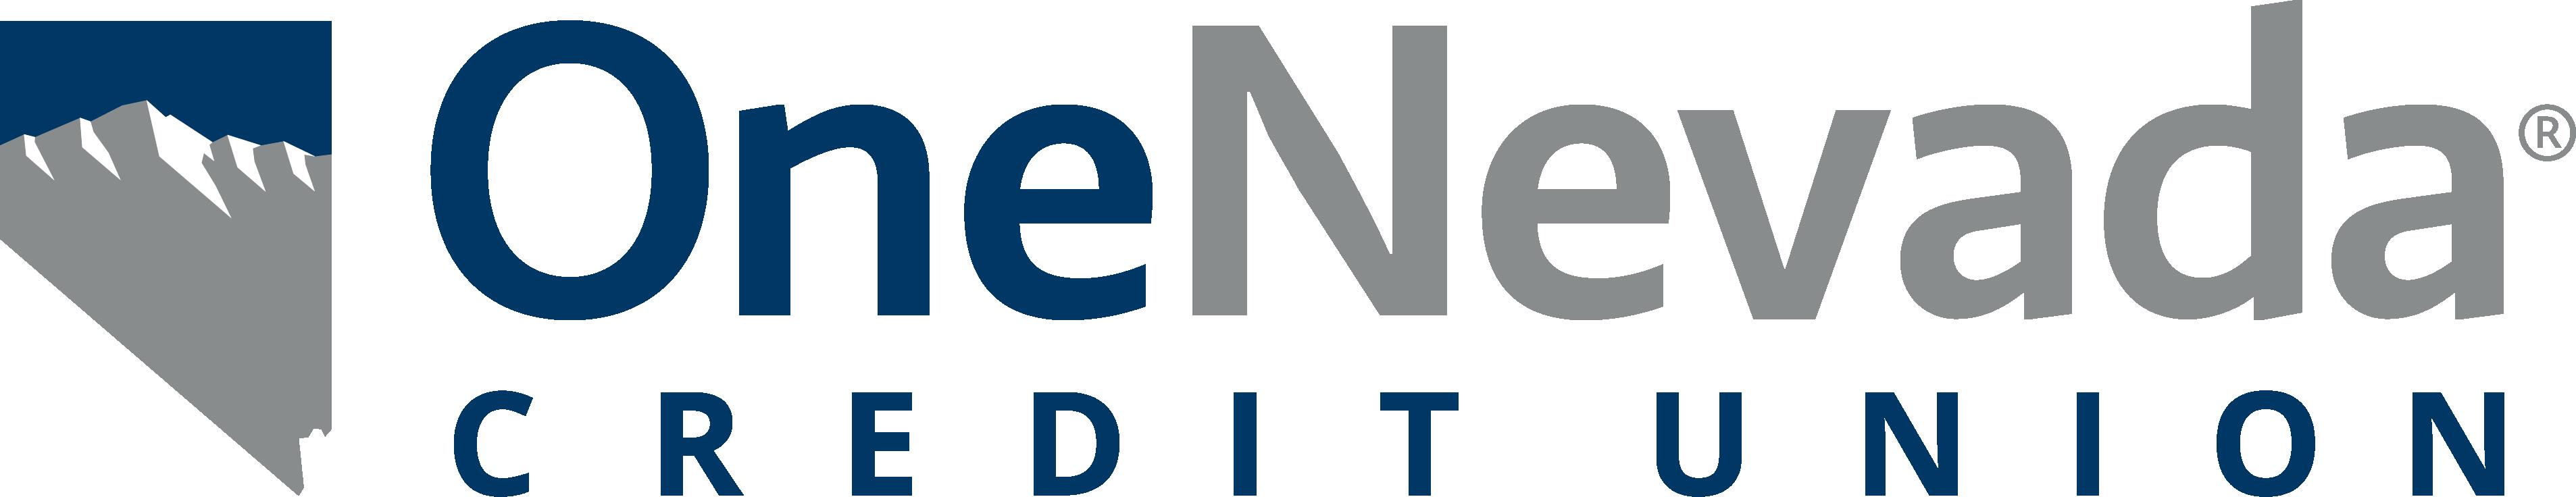 One Nevada Credit Union logo